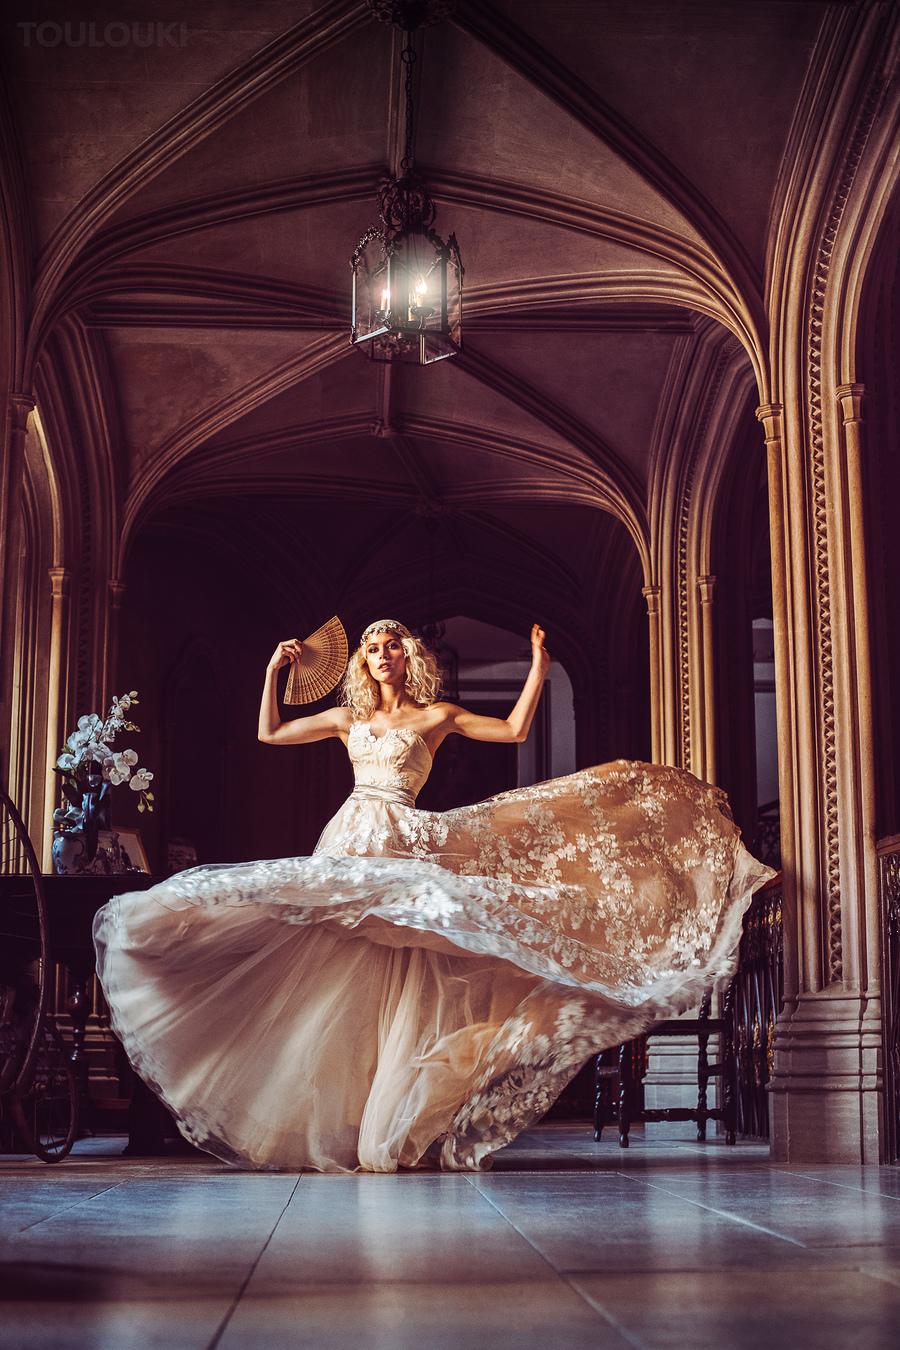 Dance / Photography by Toulouki Orsini, Post processing by Toulouki Orsini Retouching, Stylist Walter's Wardrobe / Uploaded 5th January 2020 @ 08:49 PM